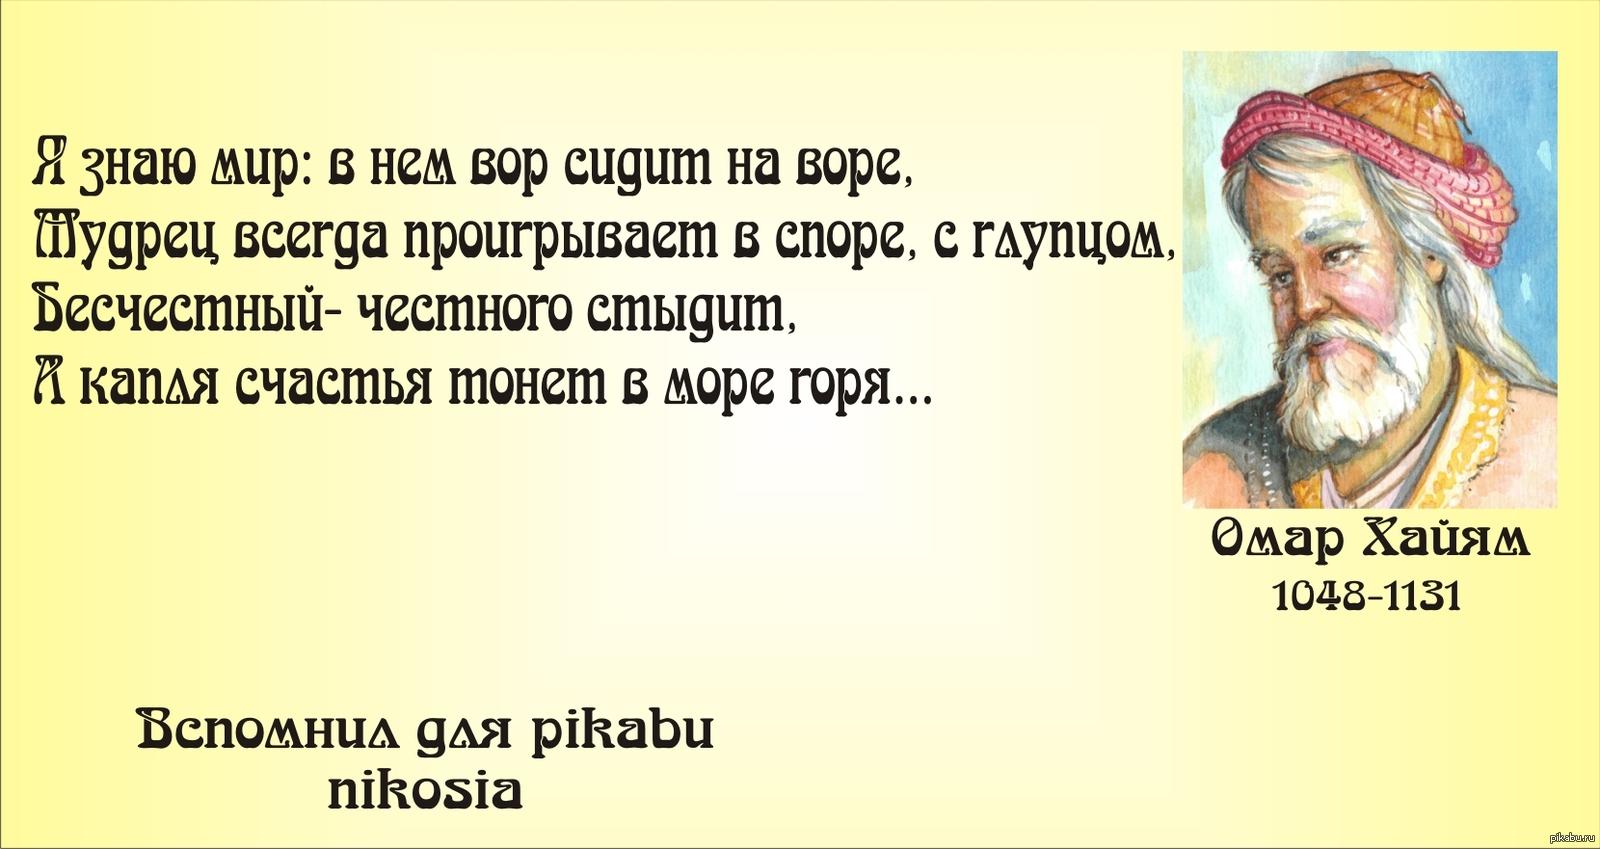 фото омар хайям с цитатами